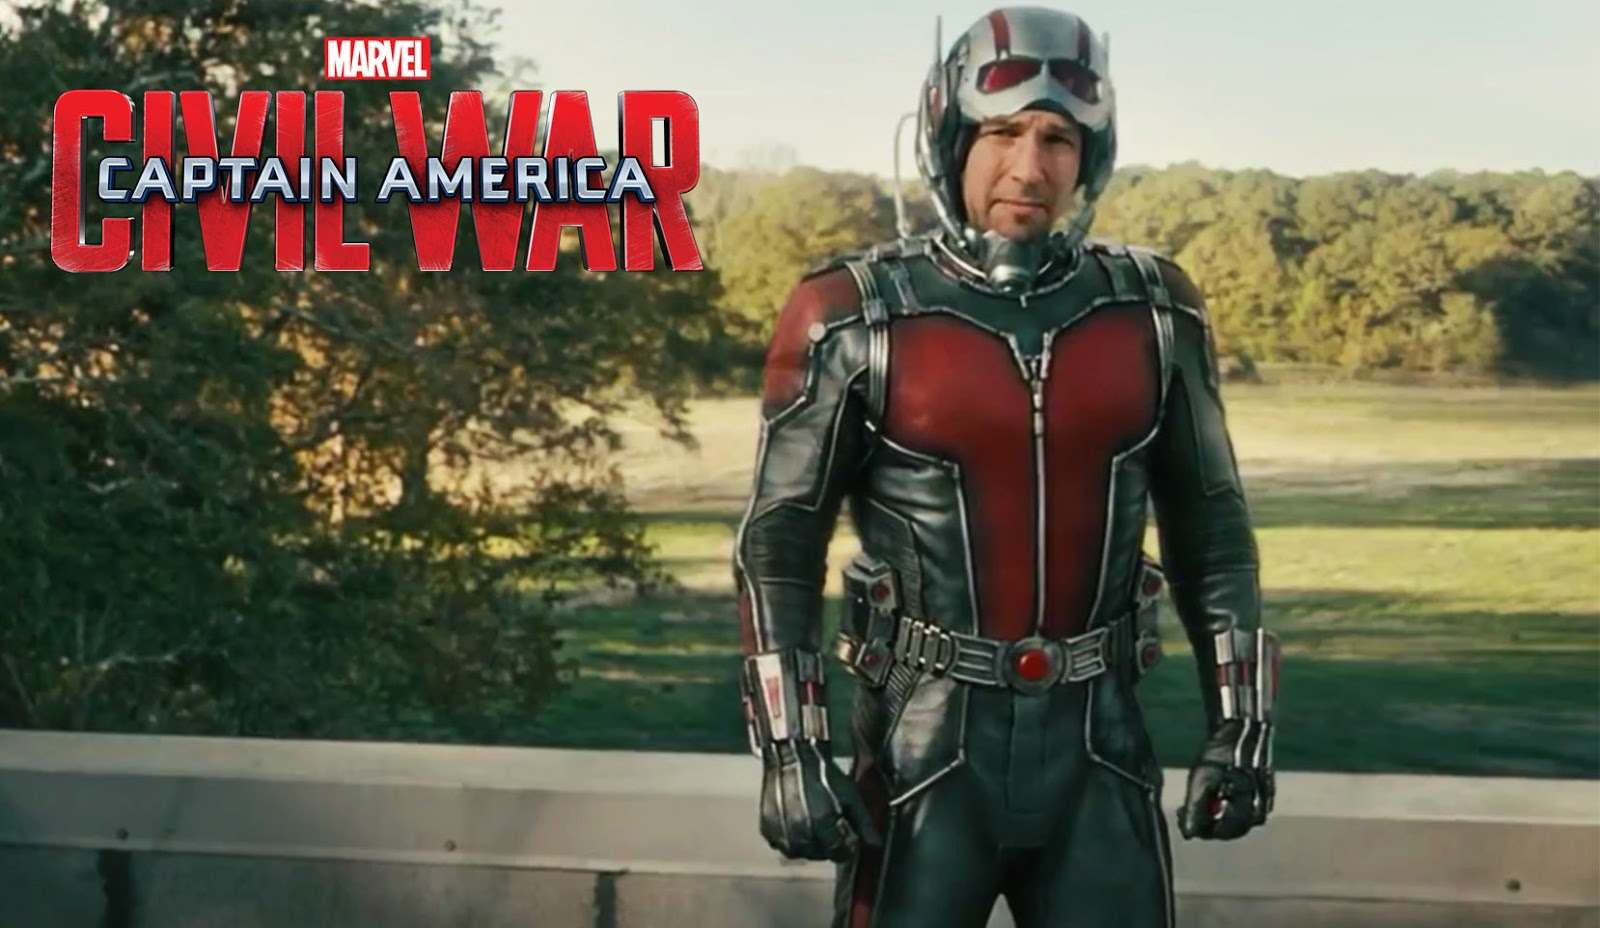 ant-man, civil war, paul rudd, scott lang, captain america